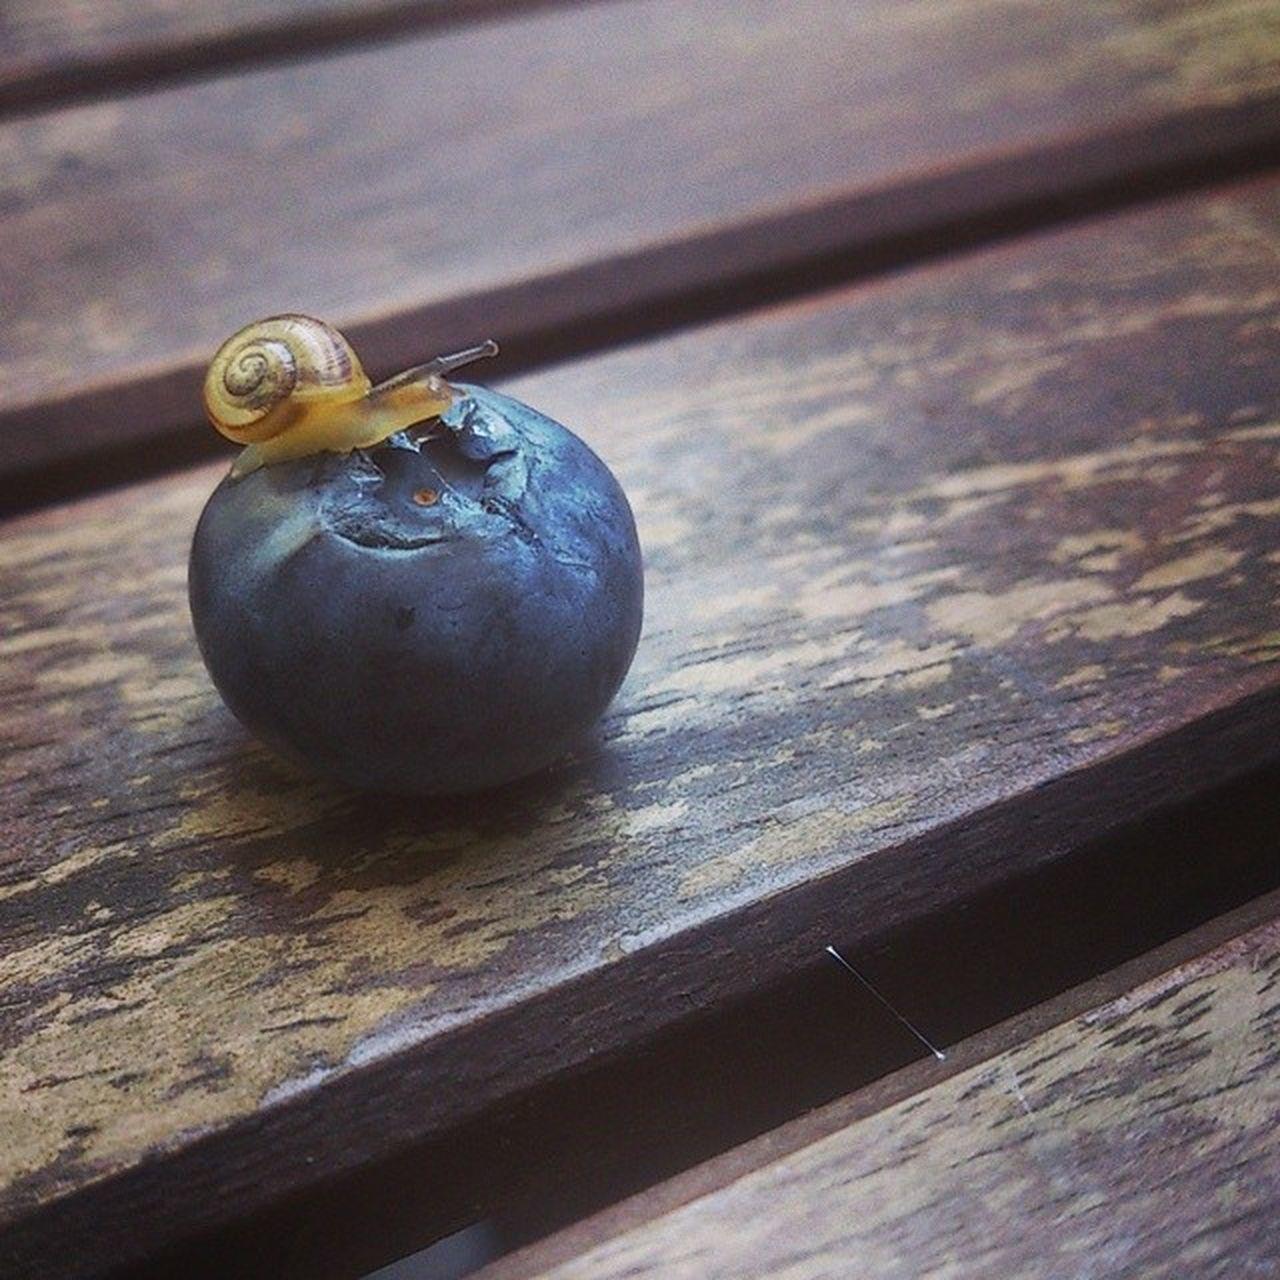 shared my lunch today.. Vegan Hclf Carbthefuckup Iwasntinvited snailsandberries tinytinysnail tinyanimals